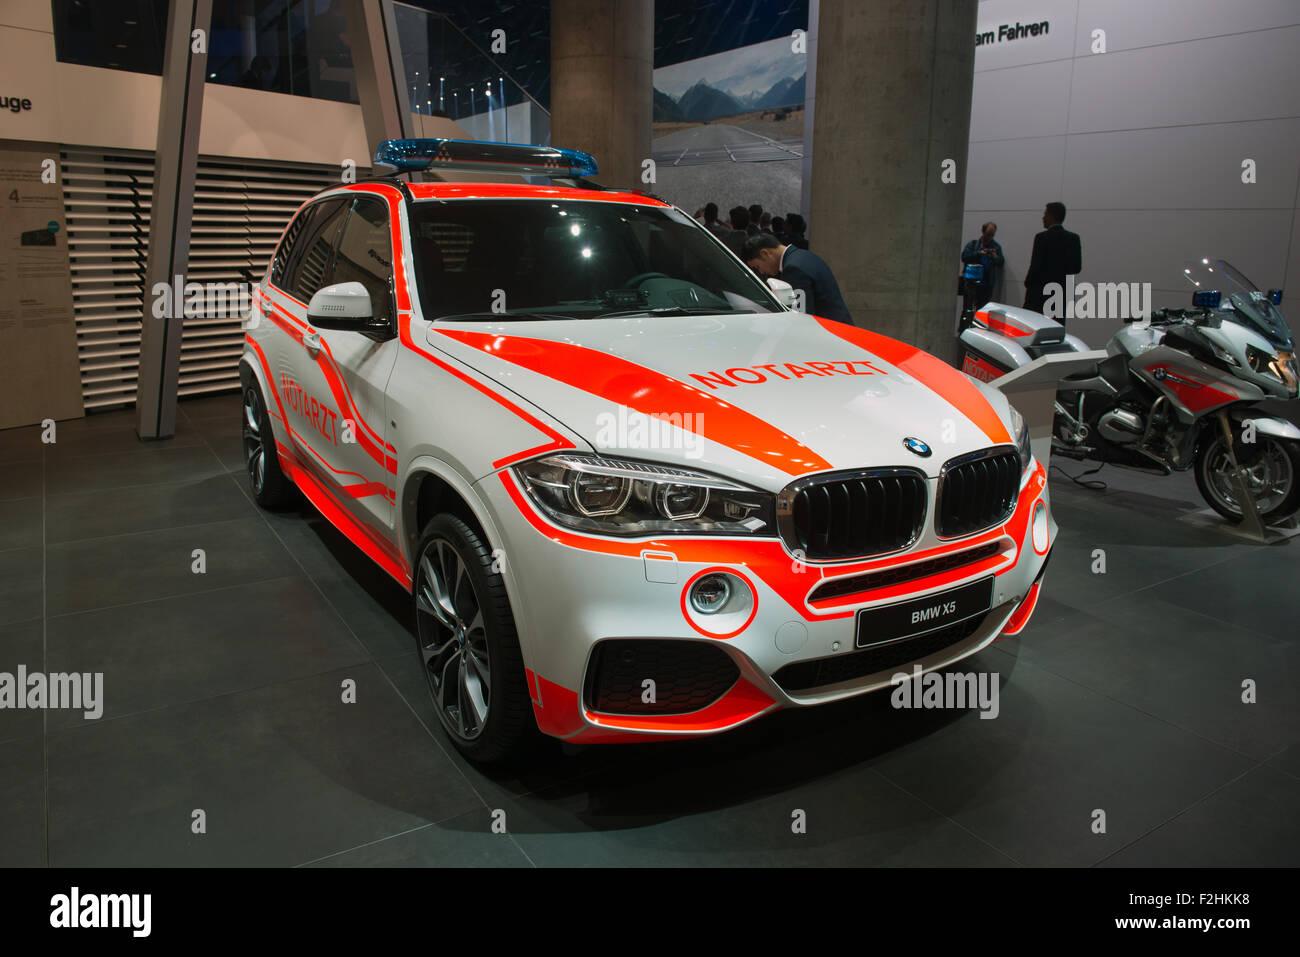 Frankfurt international motor show (IAA) 2015. BMW X5 Emergency version - Stock Image